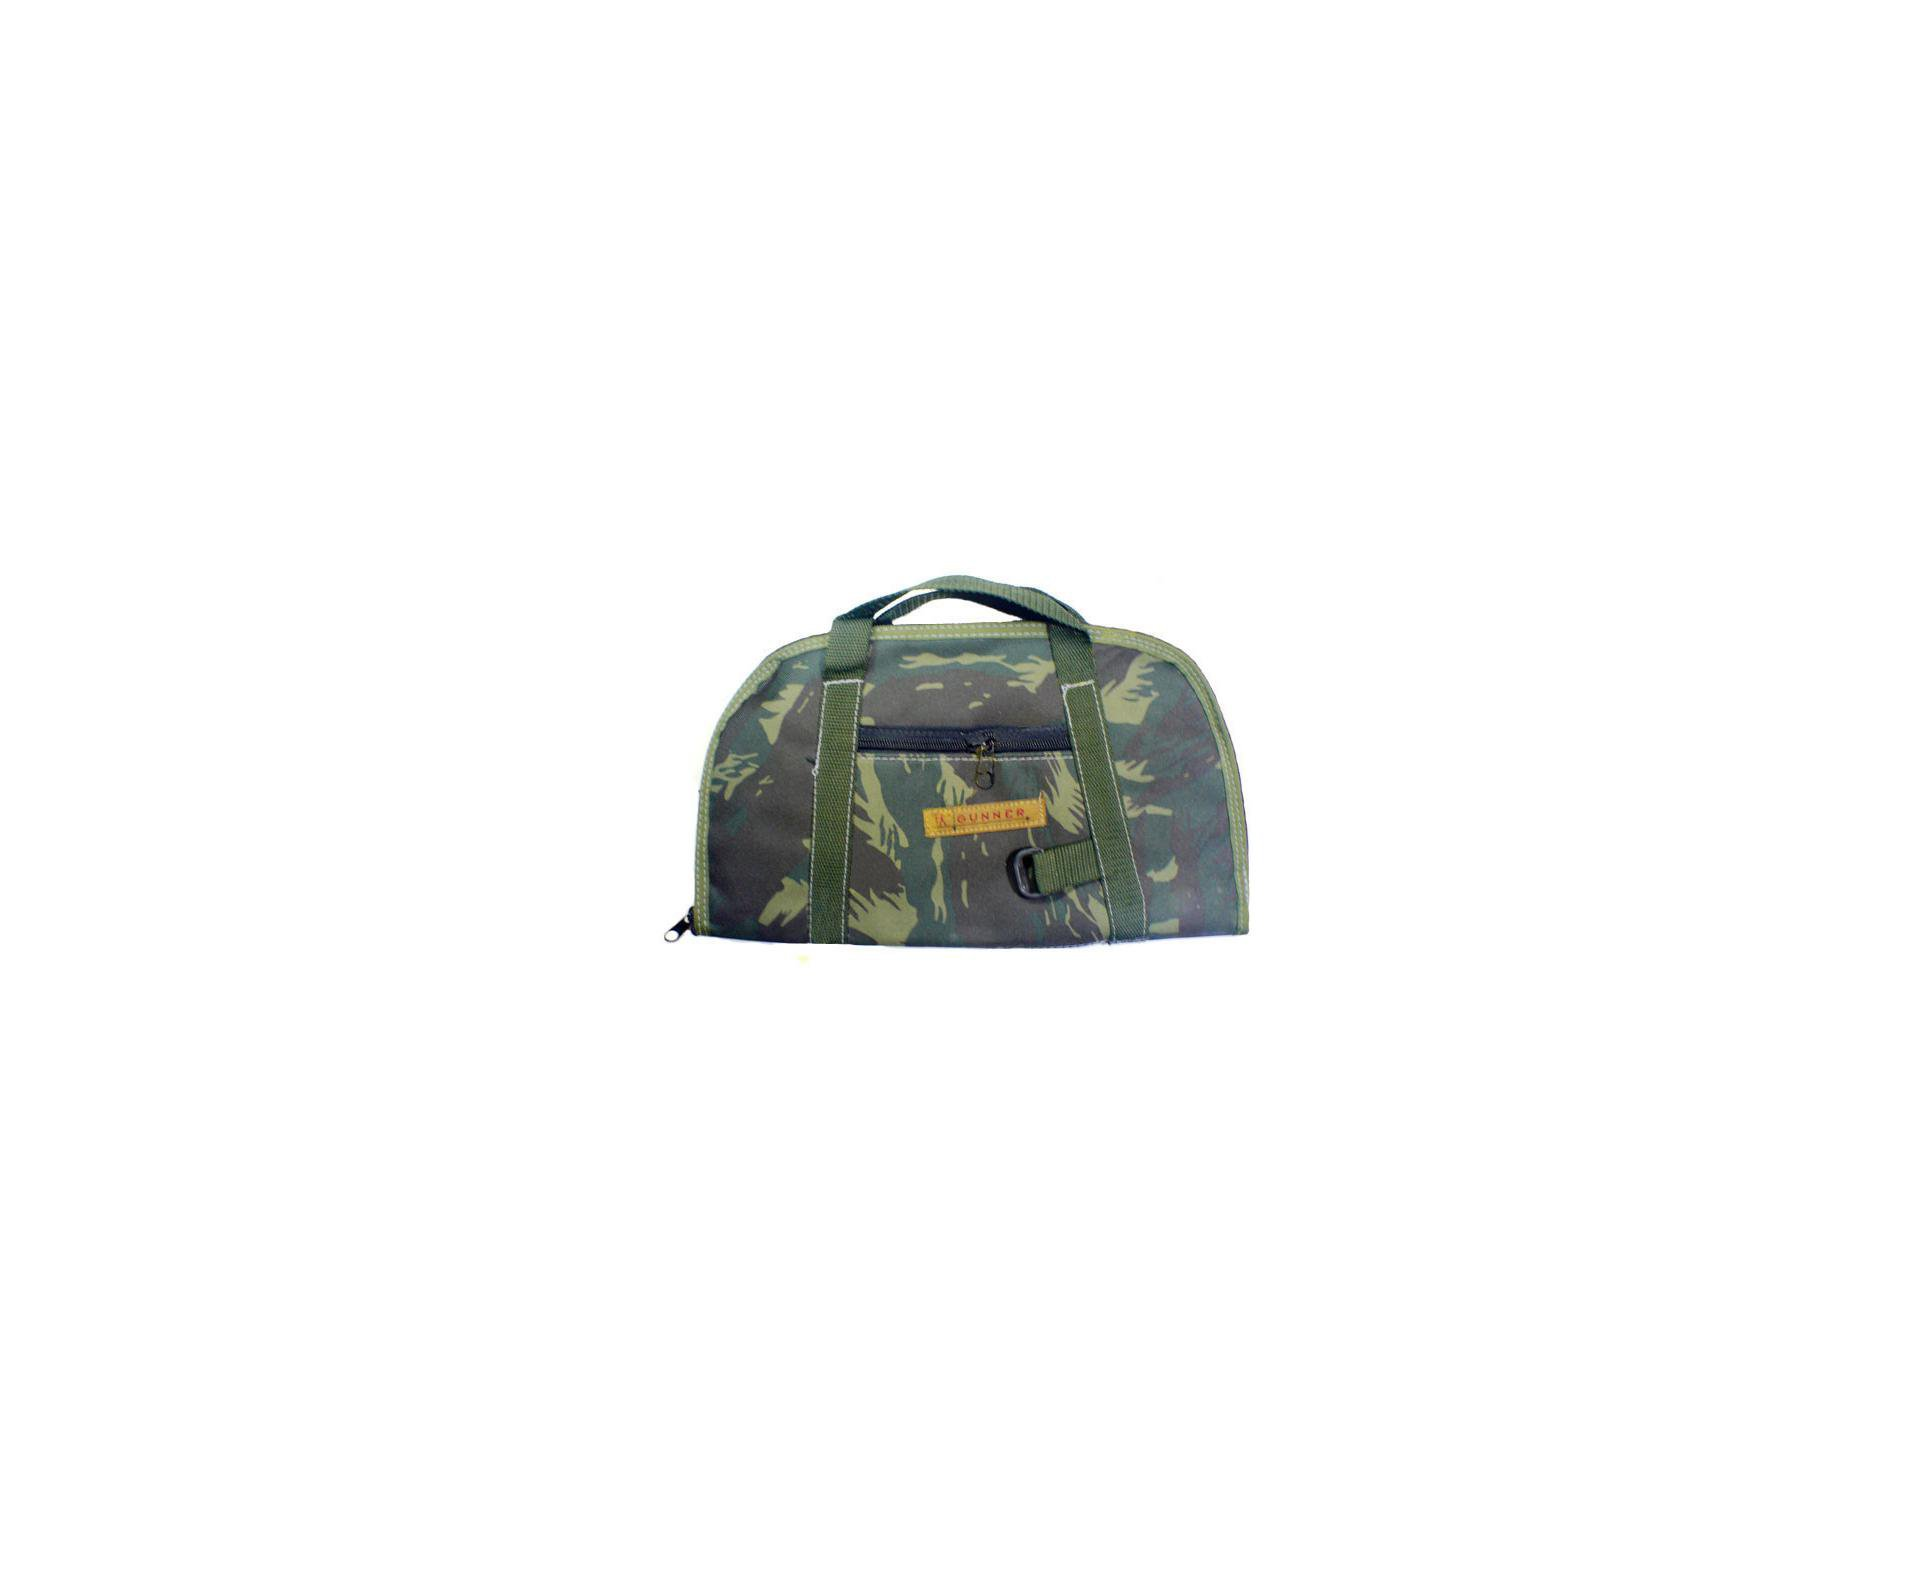 Capa Para Pistola - Gunner